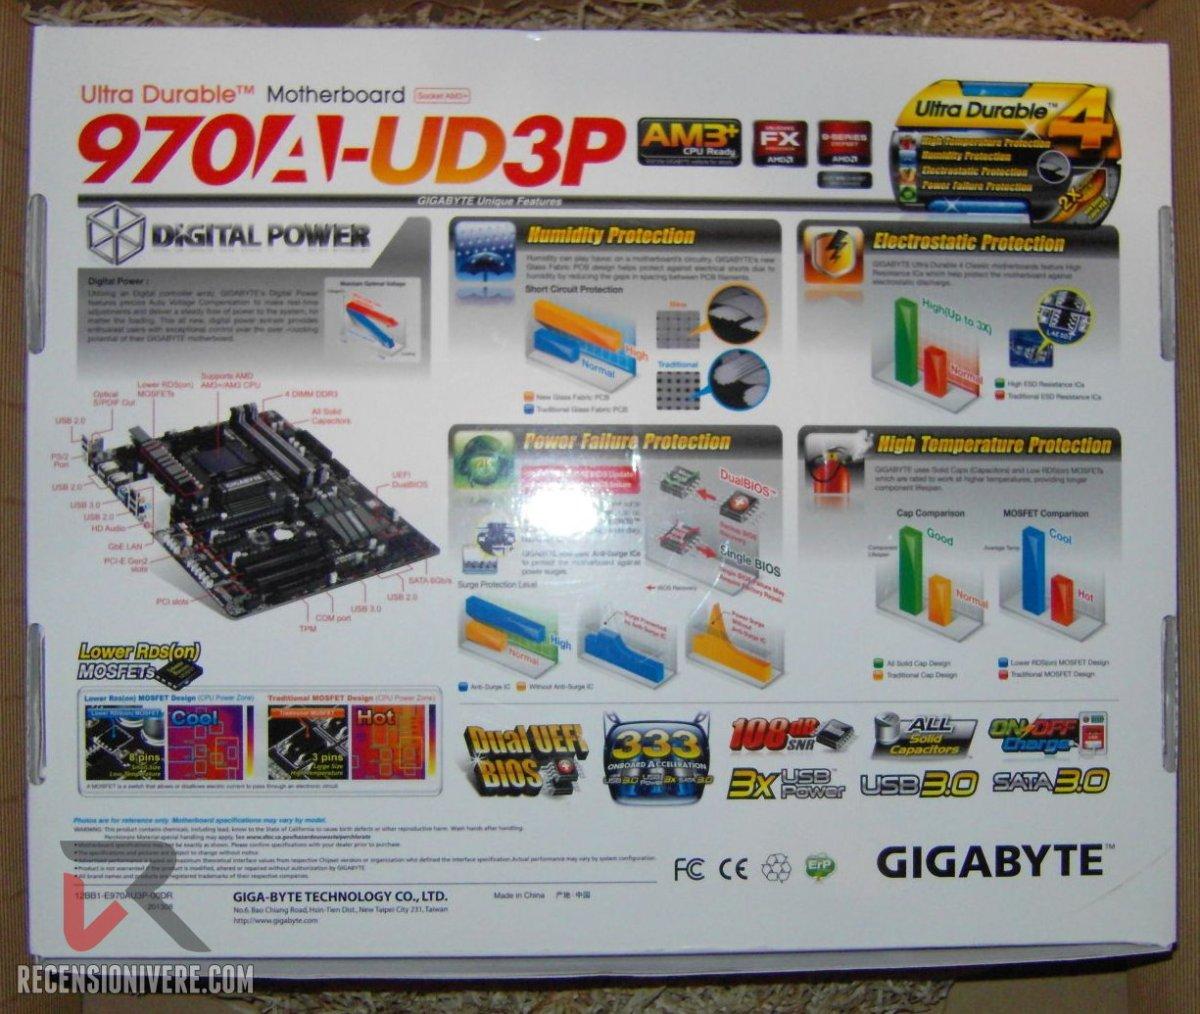 recensionivere_GA-970A-UD3P_004